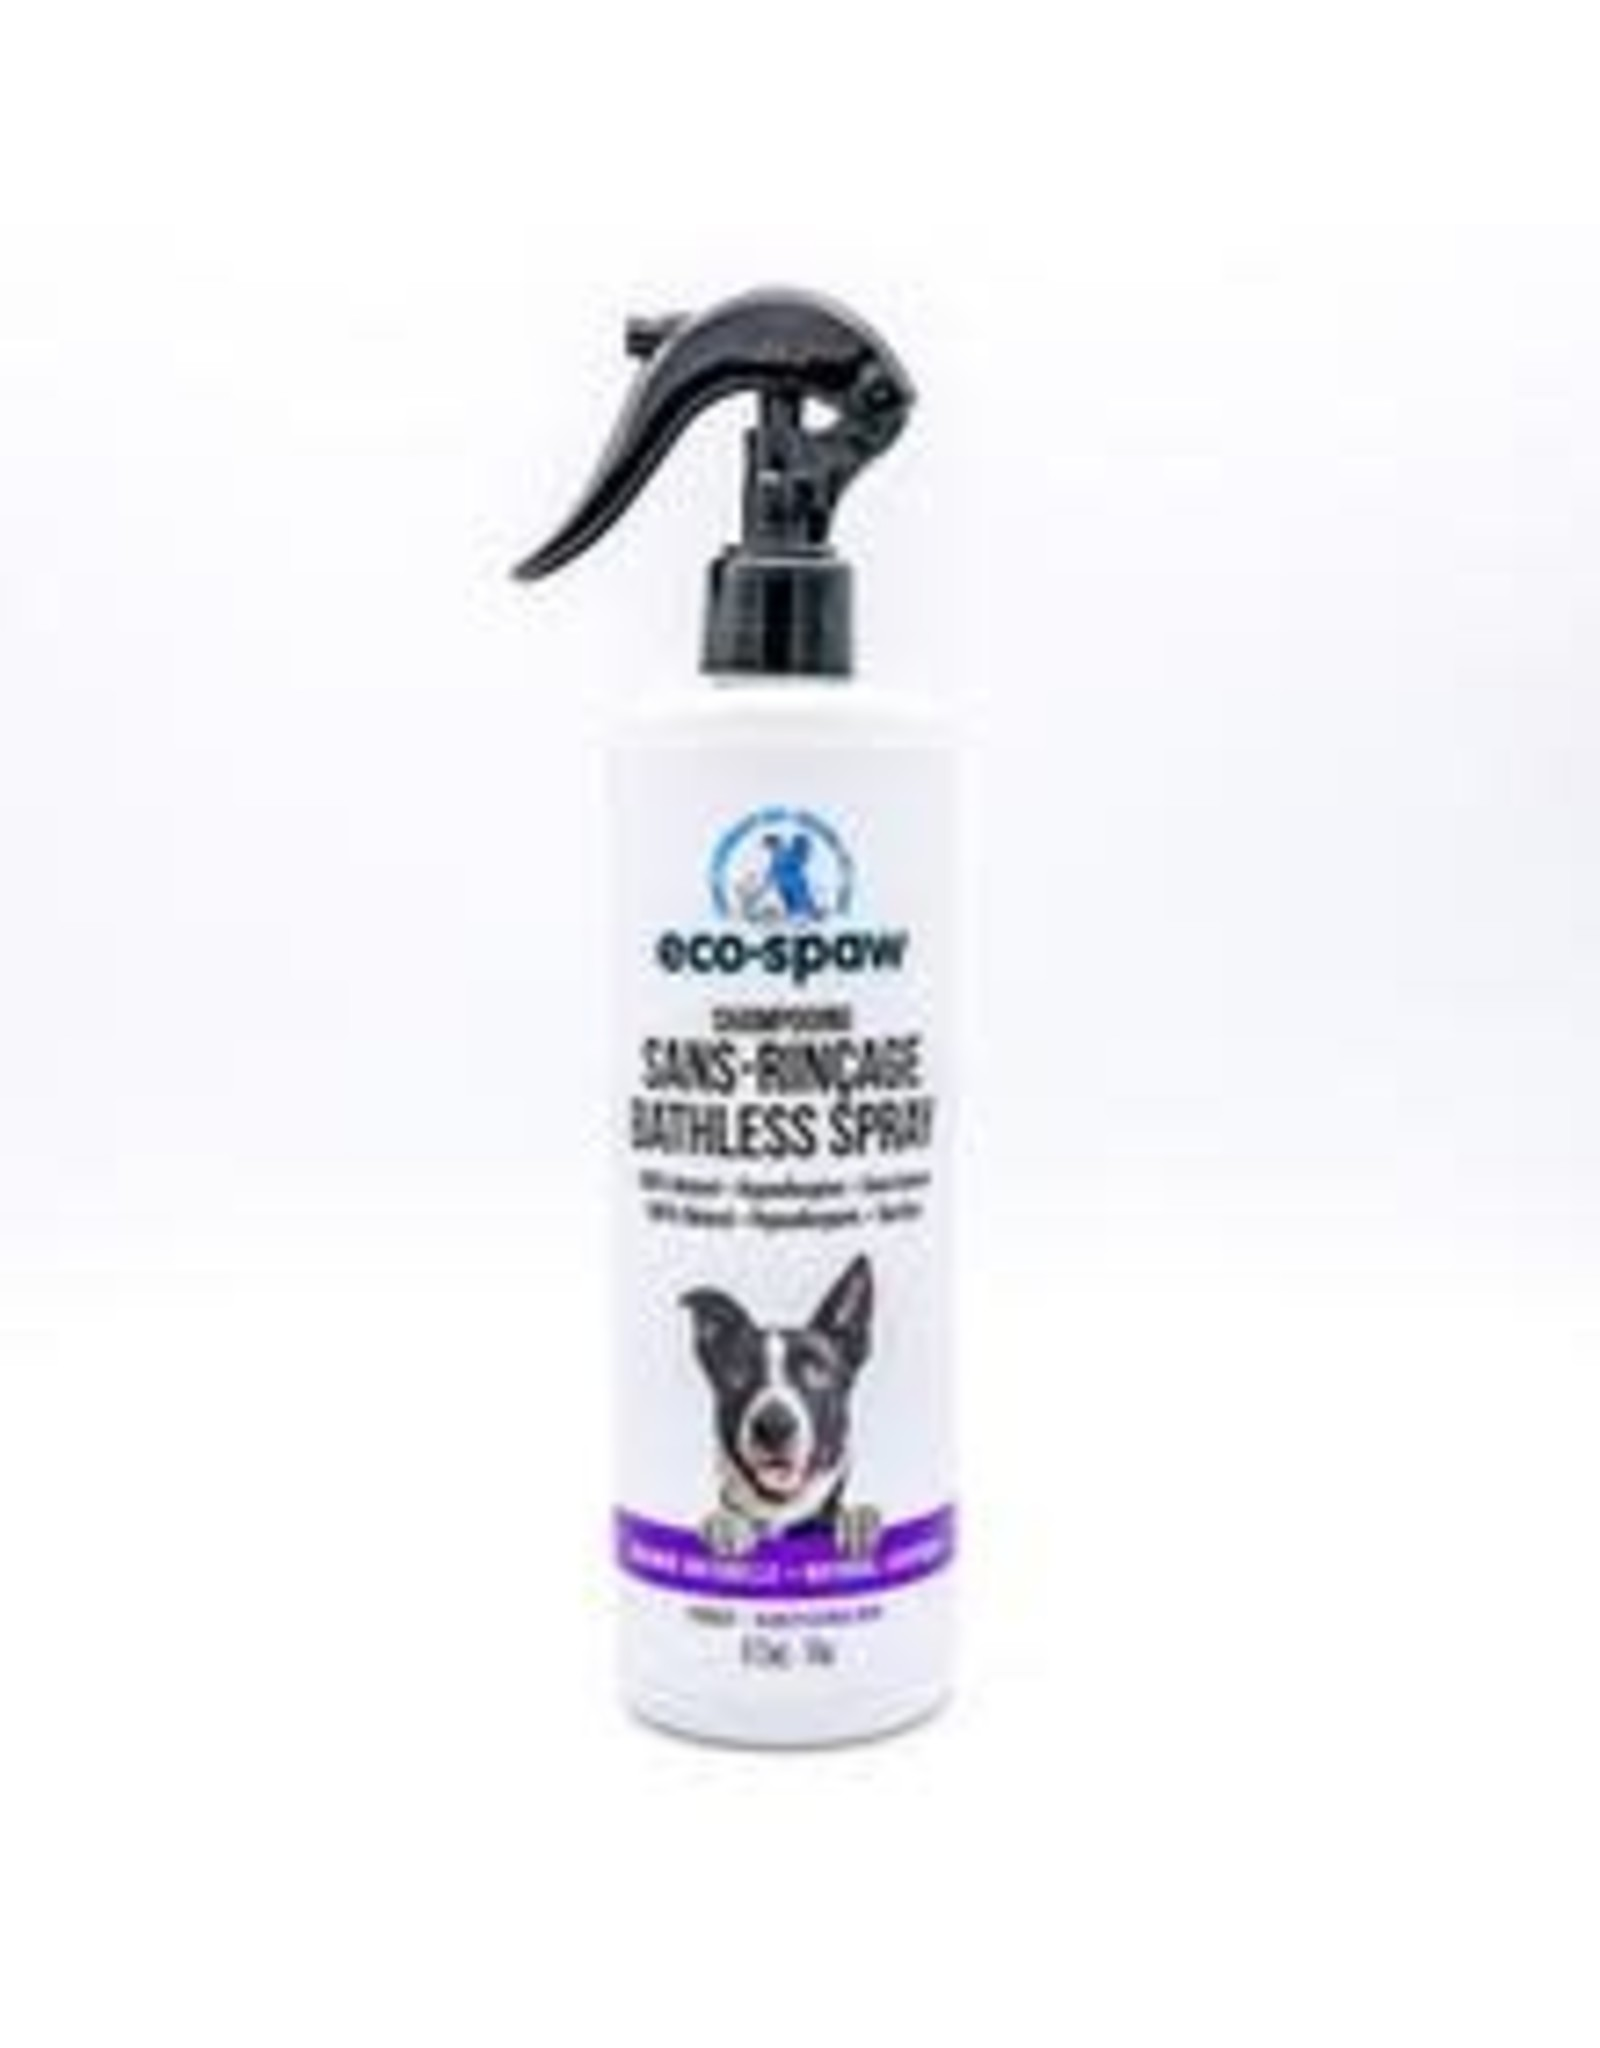 Eco-Spaw Eco-Spaw - Bathless Spray 16oz - Lavender